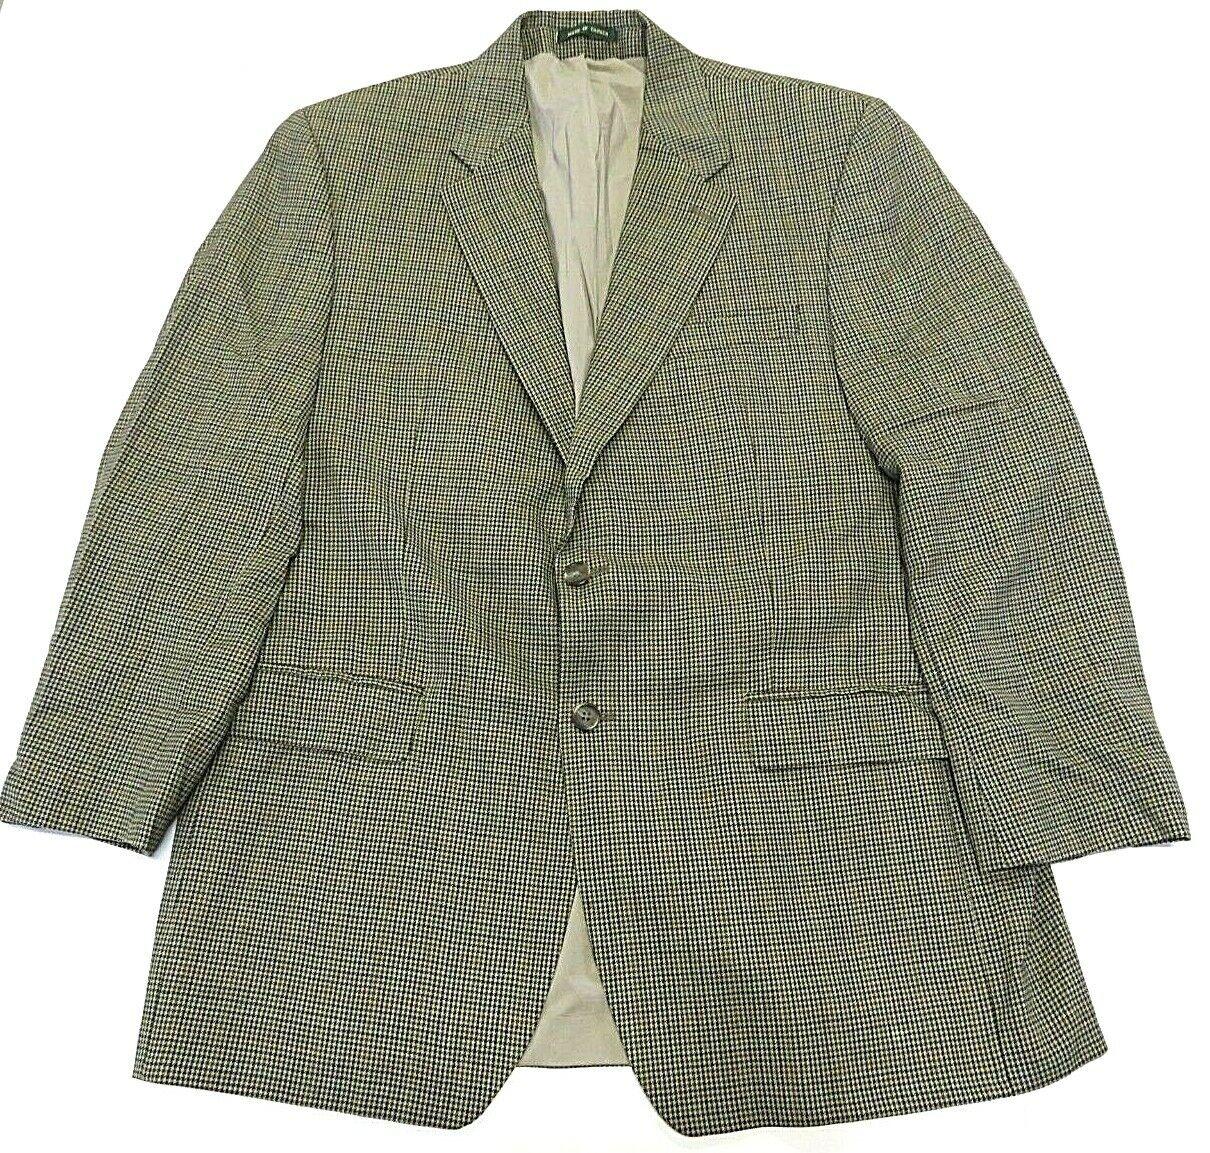 Lauren by Ralph Lauren 100% Wool Two Button Houndstooth Blazer Men's Size 44 L